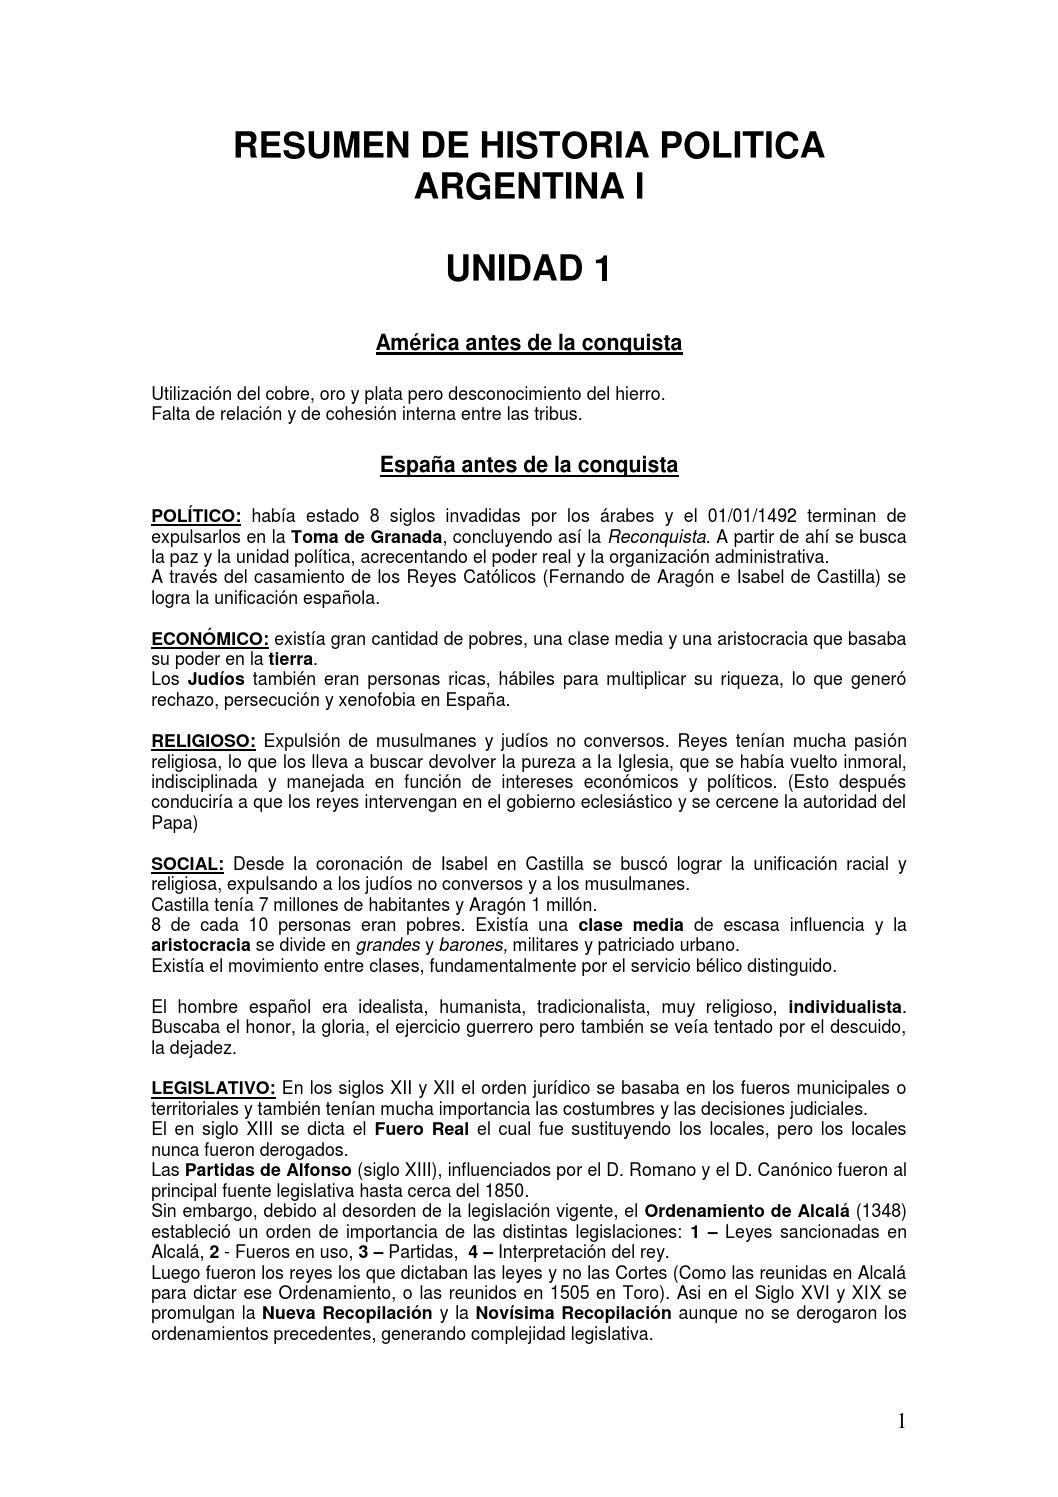 Resumen historia politica argentina i (1) by Agostina Bongiovanni ...